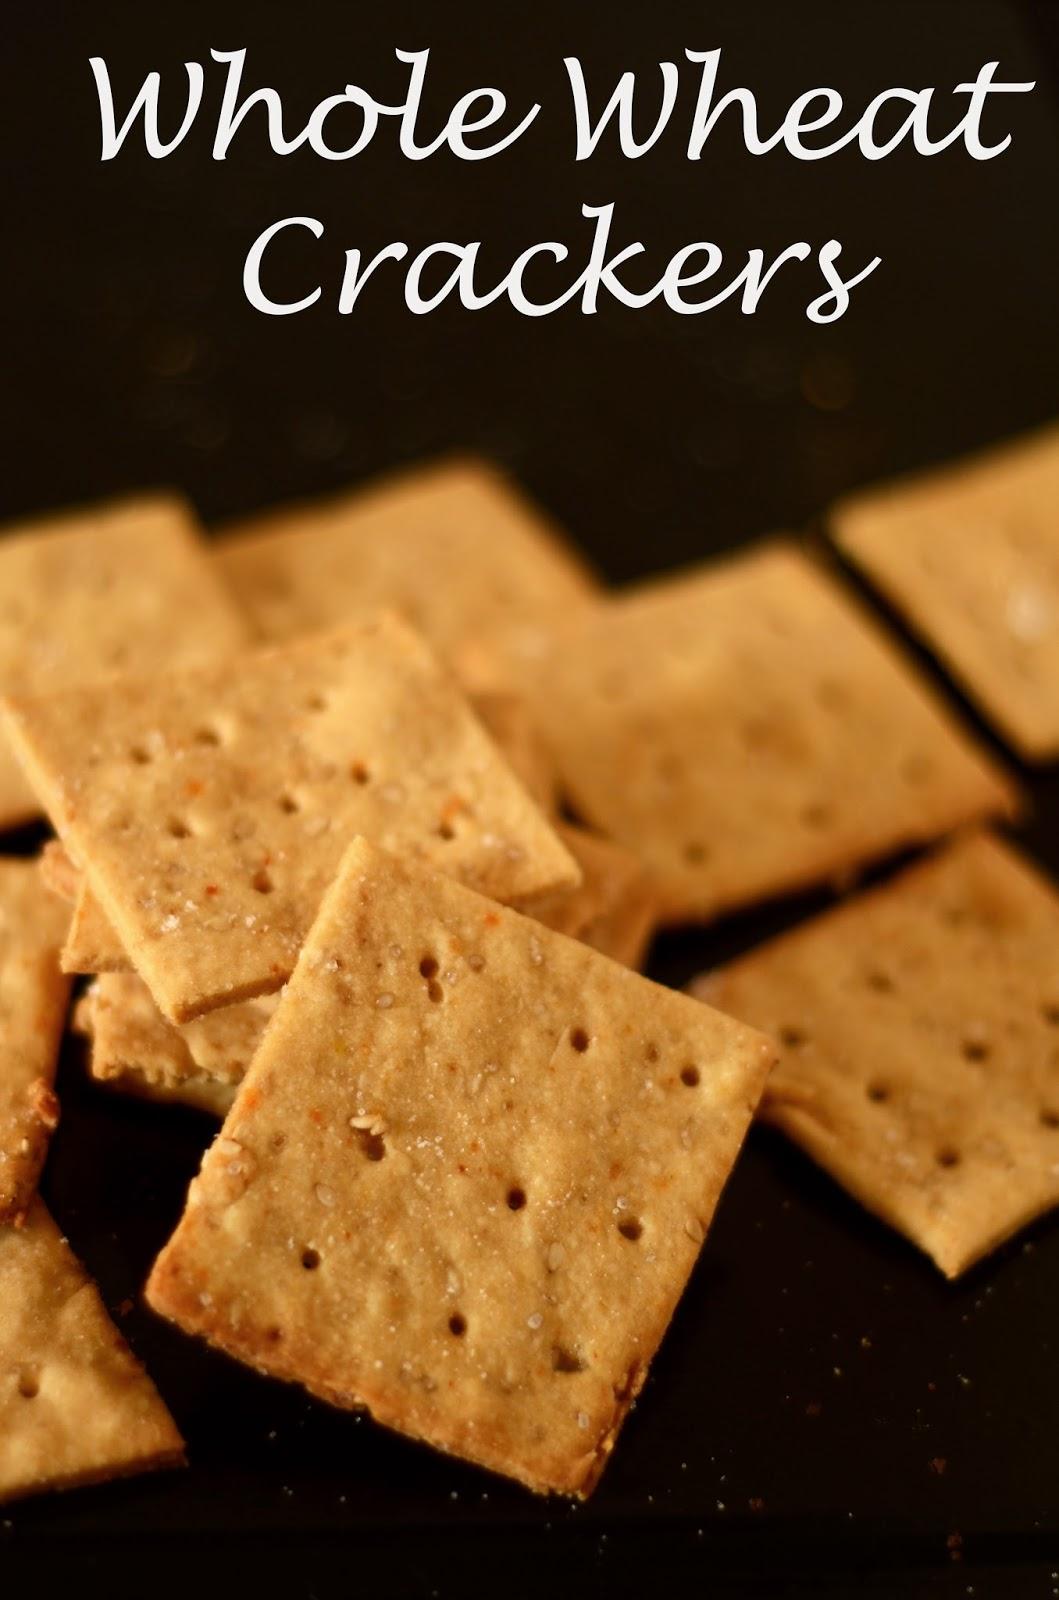 Kuch Pak Raha Hai: Whole Wheat Crackers